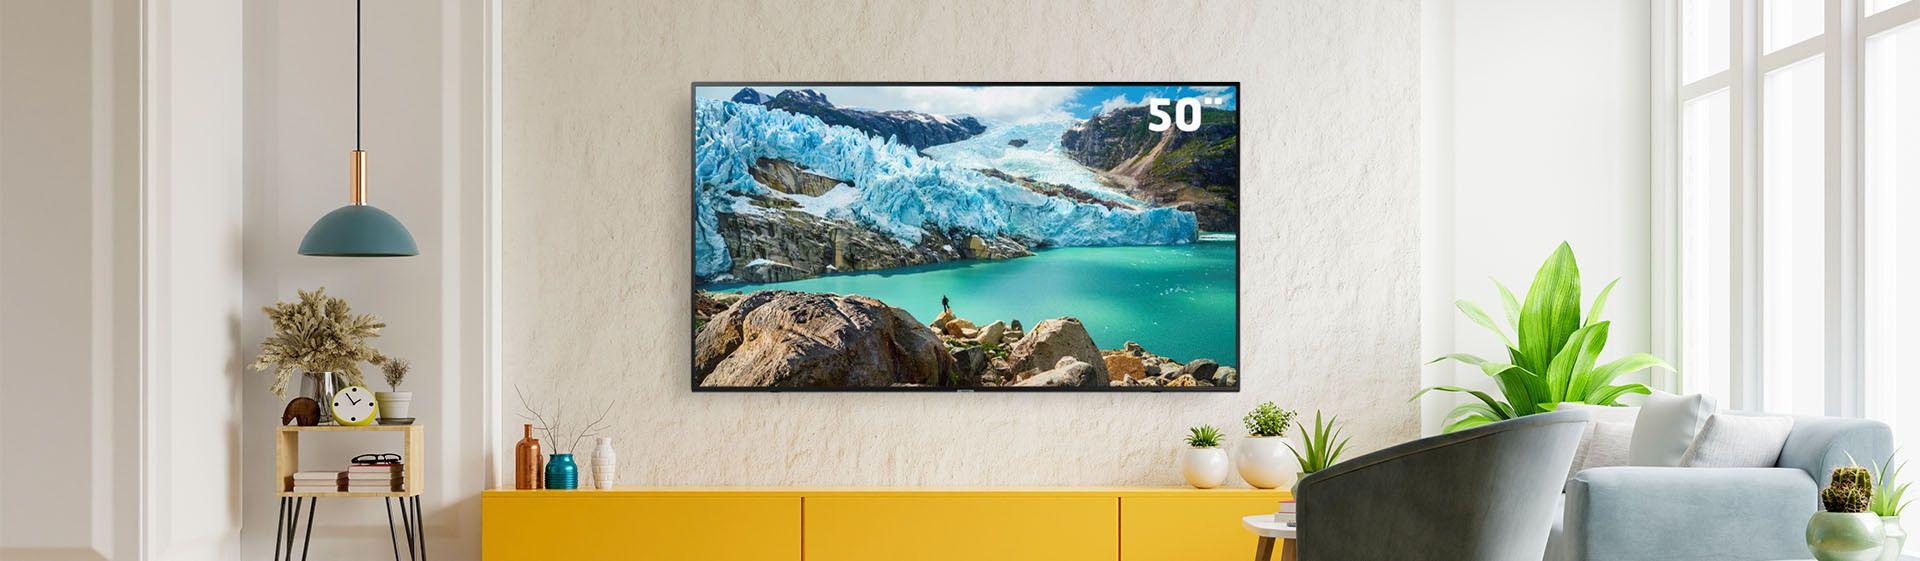 Smart TV LG UN7100: veja detalhes dessa TV 4K da LG com plataforma ThinQ AI